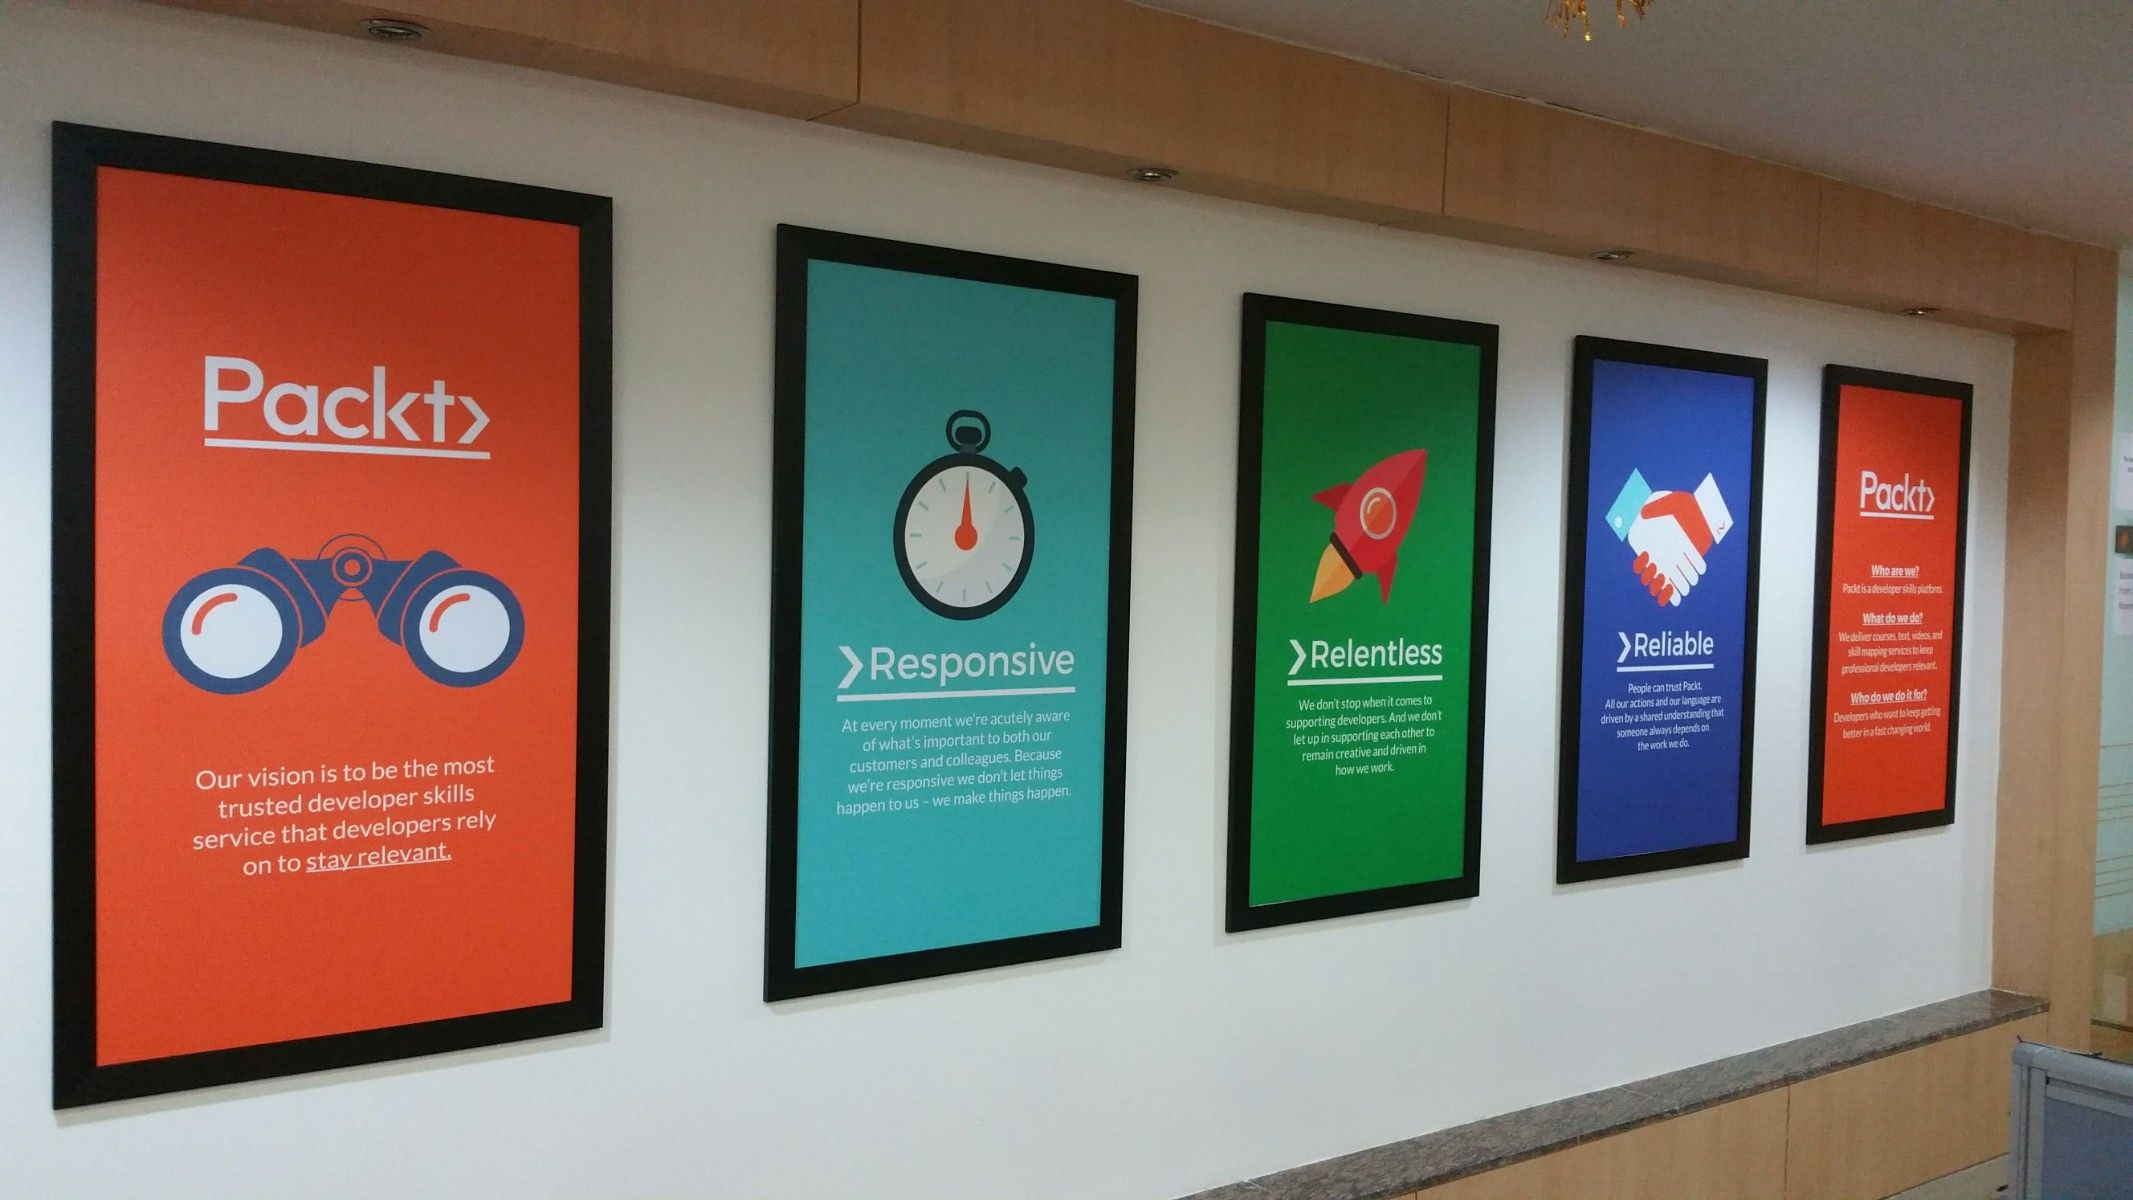 Business Values Packt Office Wall Design Motivational Office Decor Corporate Interior Design